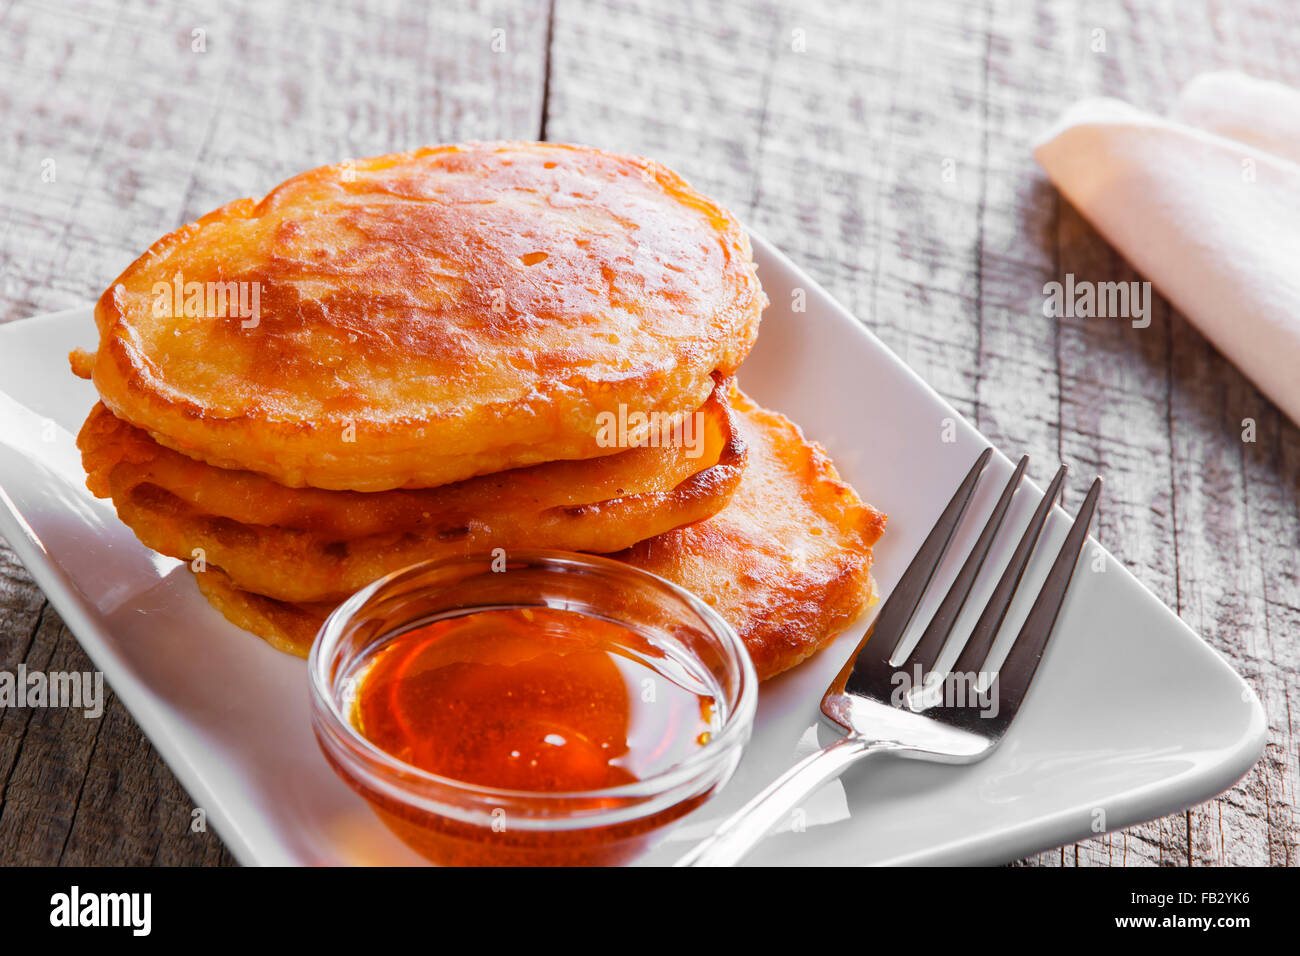 Pancakes con sirope de arce zanahoria buñuelos de desayuno Imagen De Stock